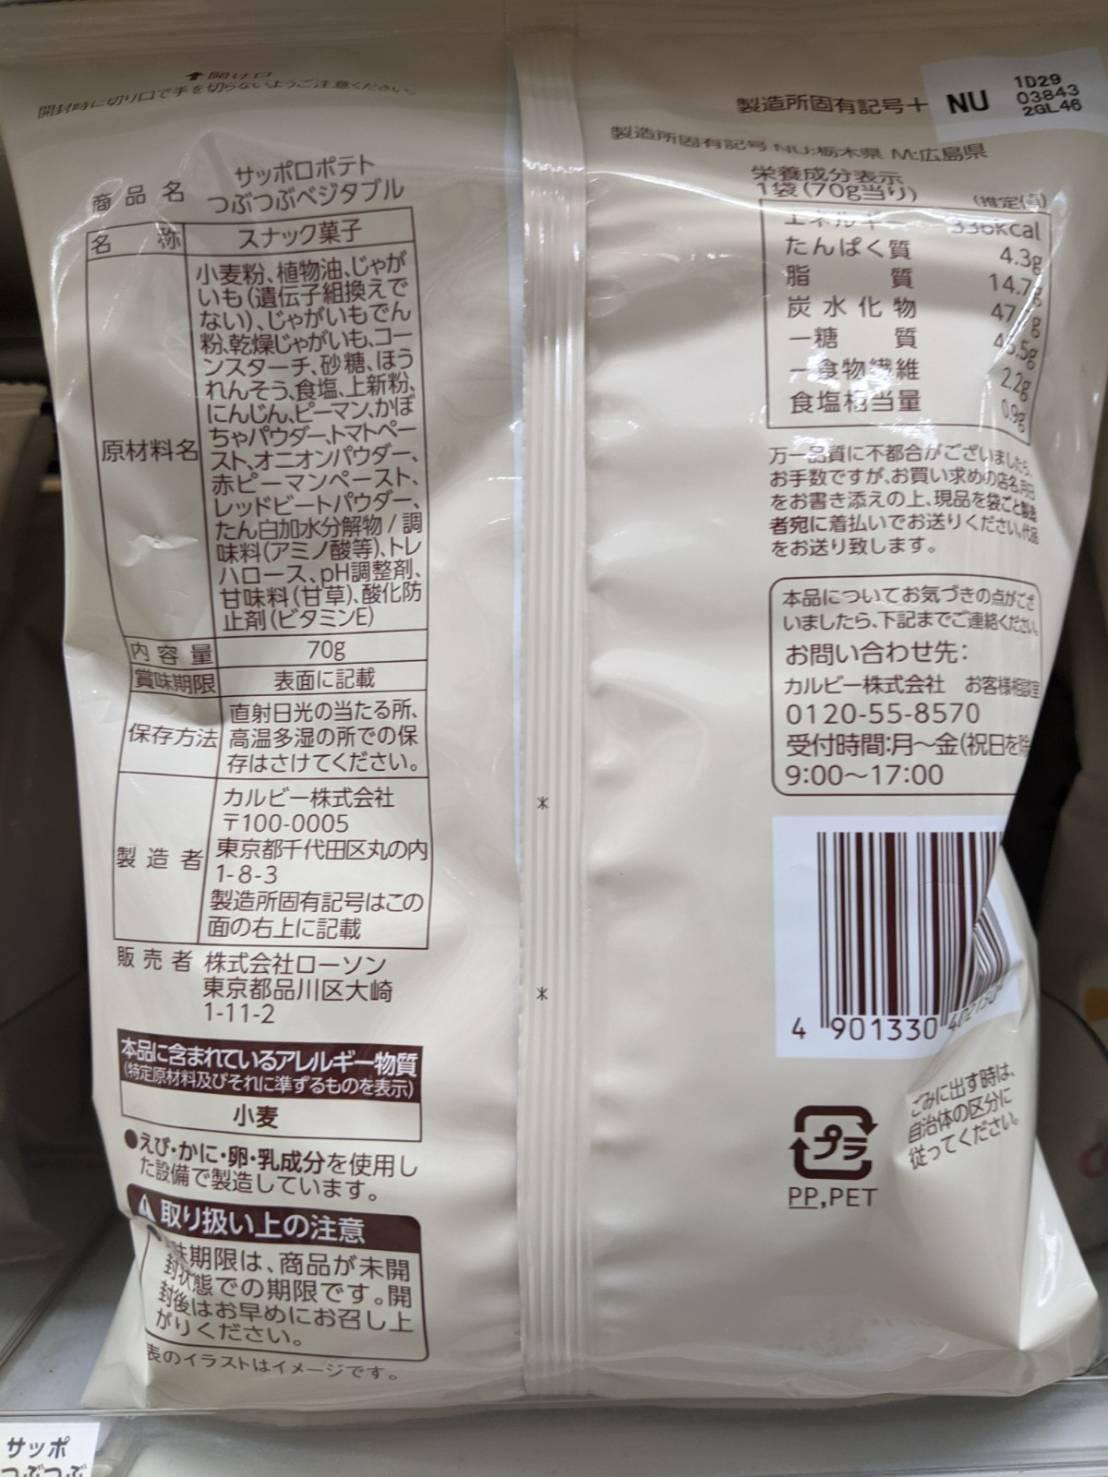 Lawson Calbee Sapporo Potato Light Texture Vegetable Sticks back of package